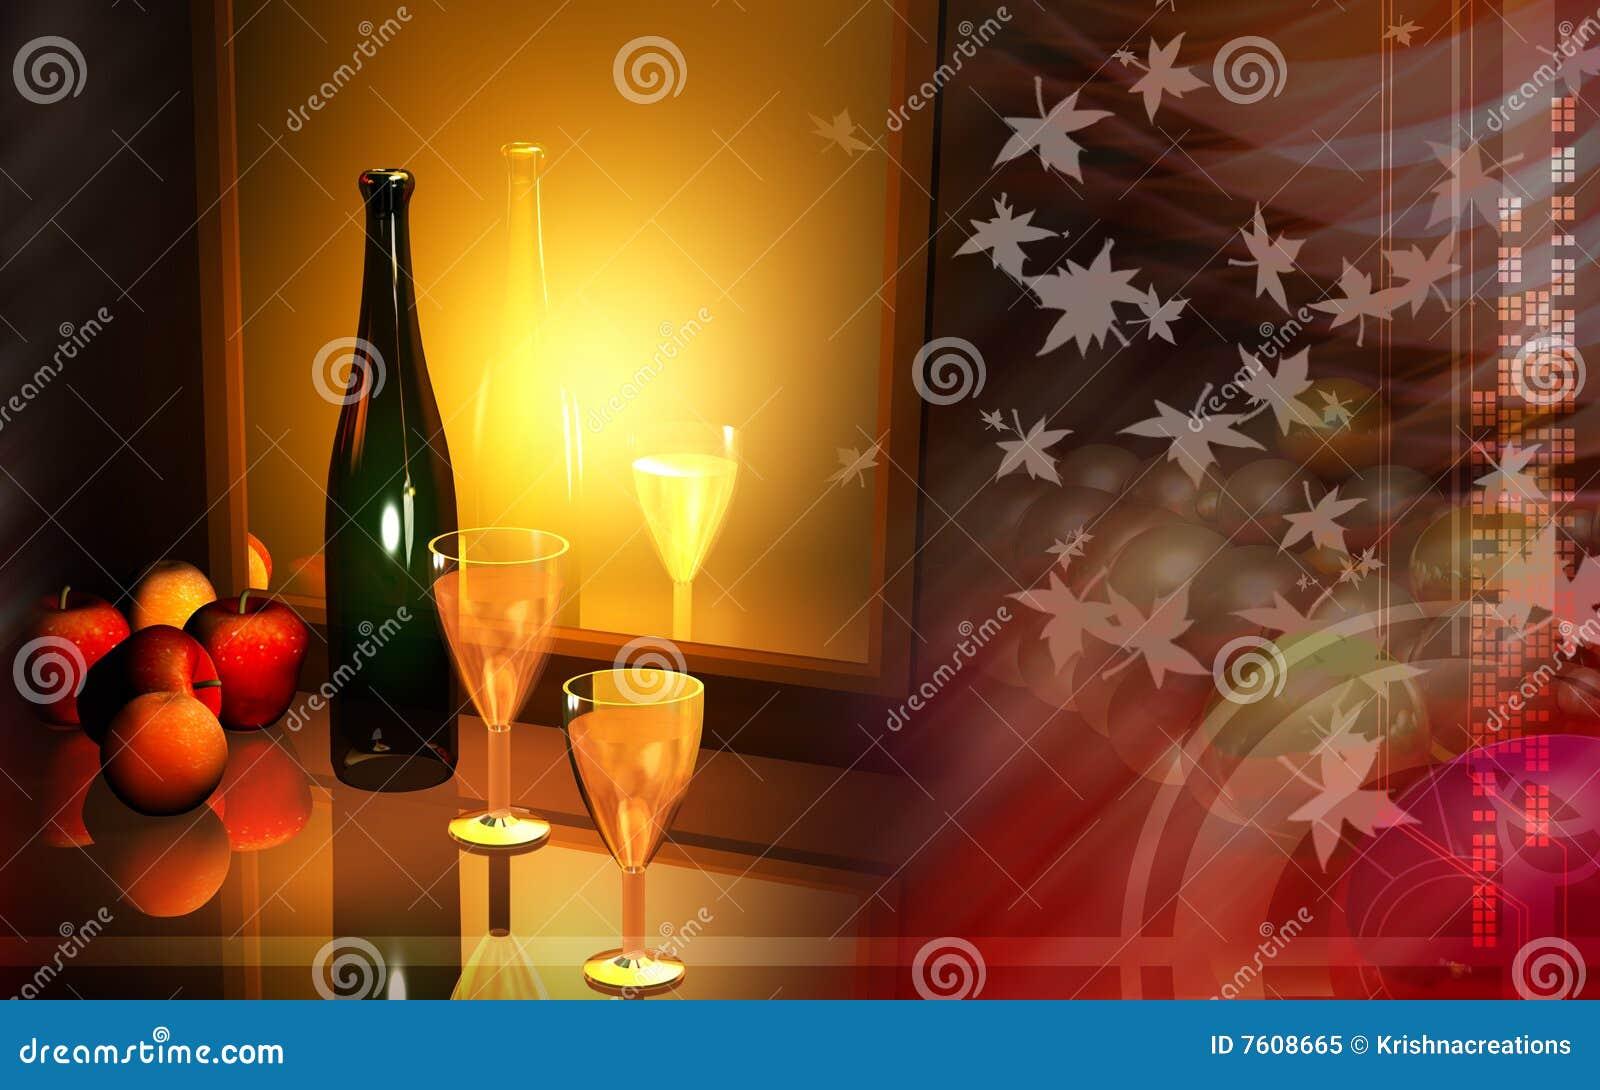 Wine and apple